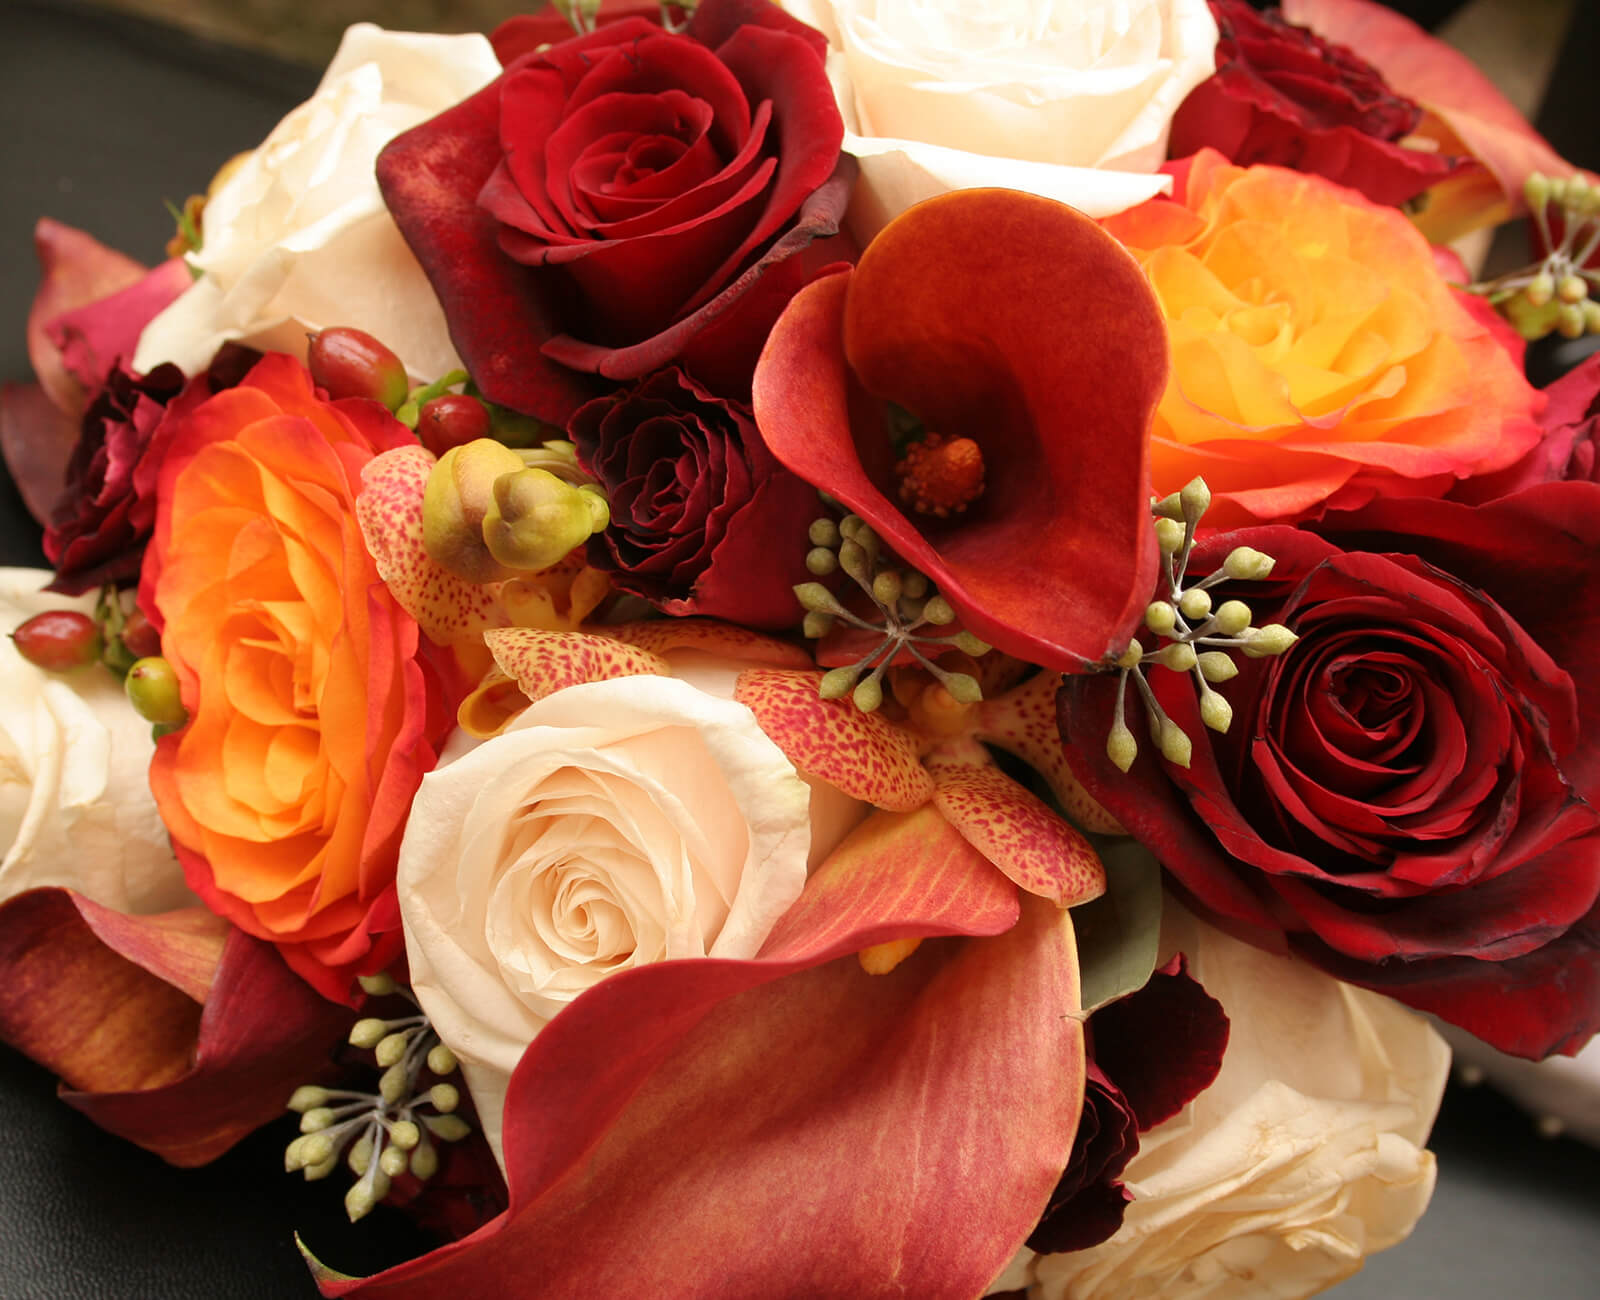 fall-wedding-bouquet-ideas.jpg